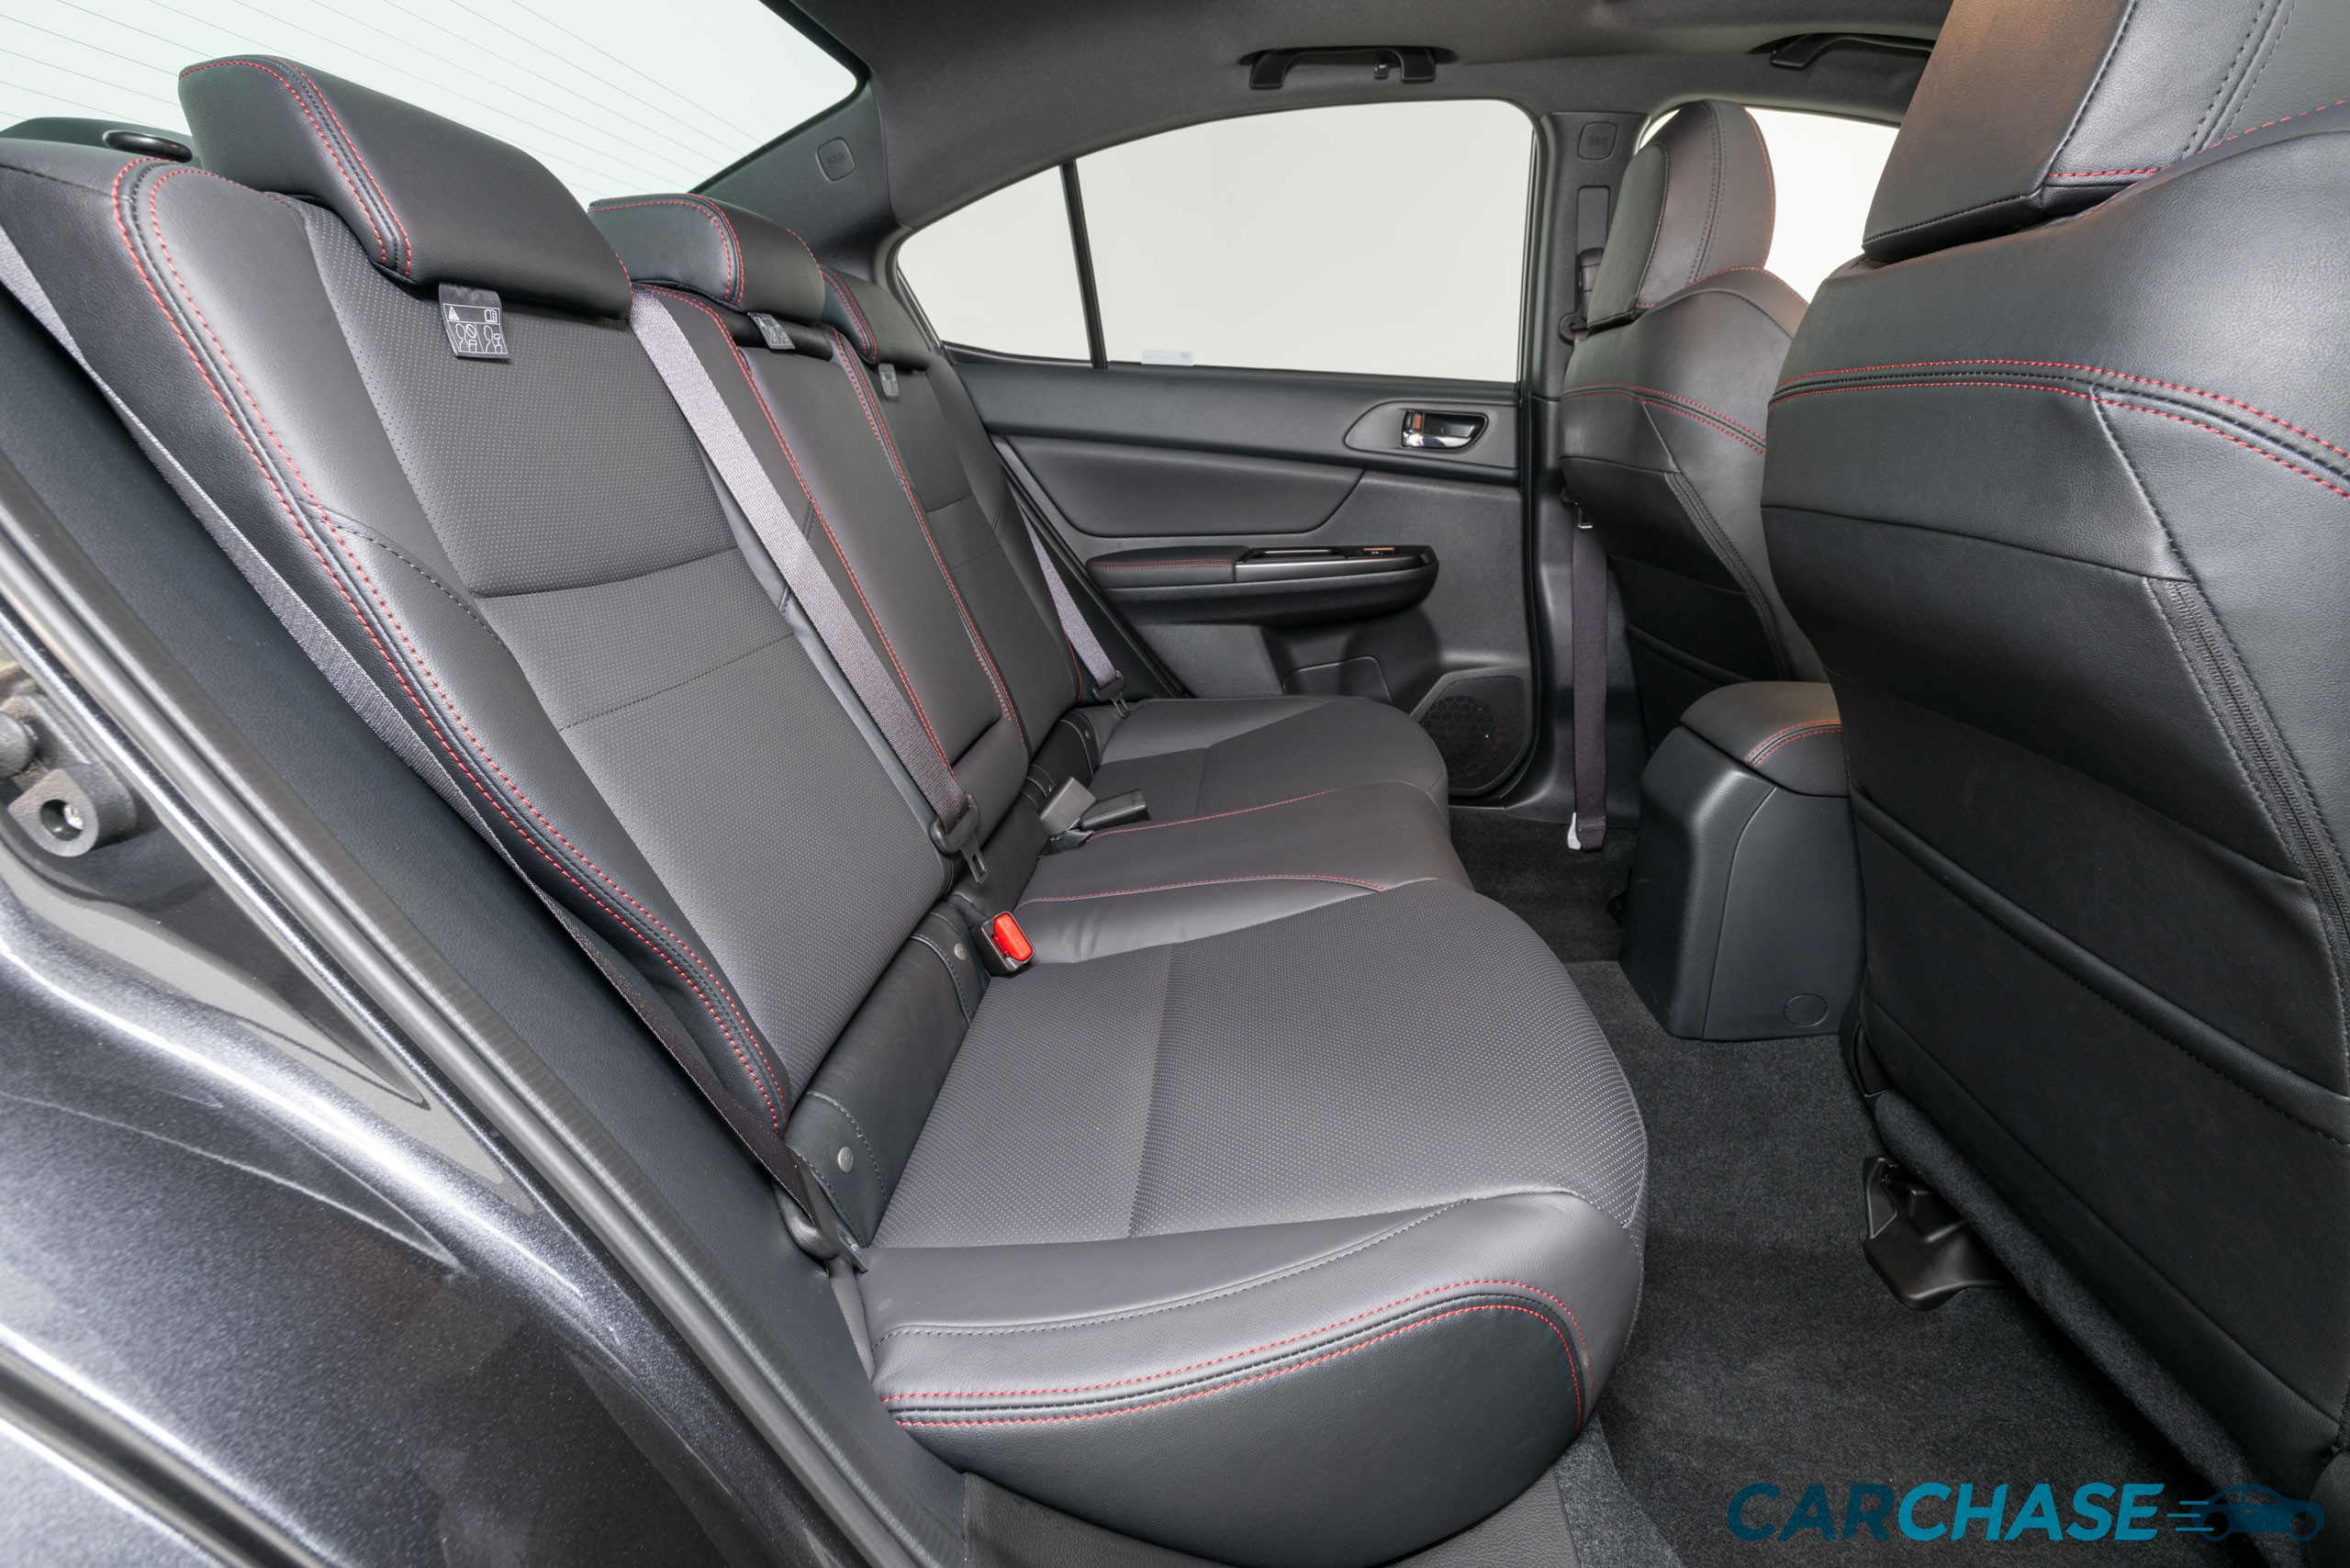 Image of rear driver profile of 2018 Subaru WRX Premium